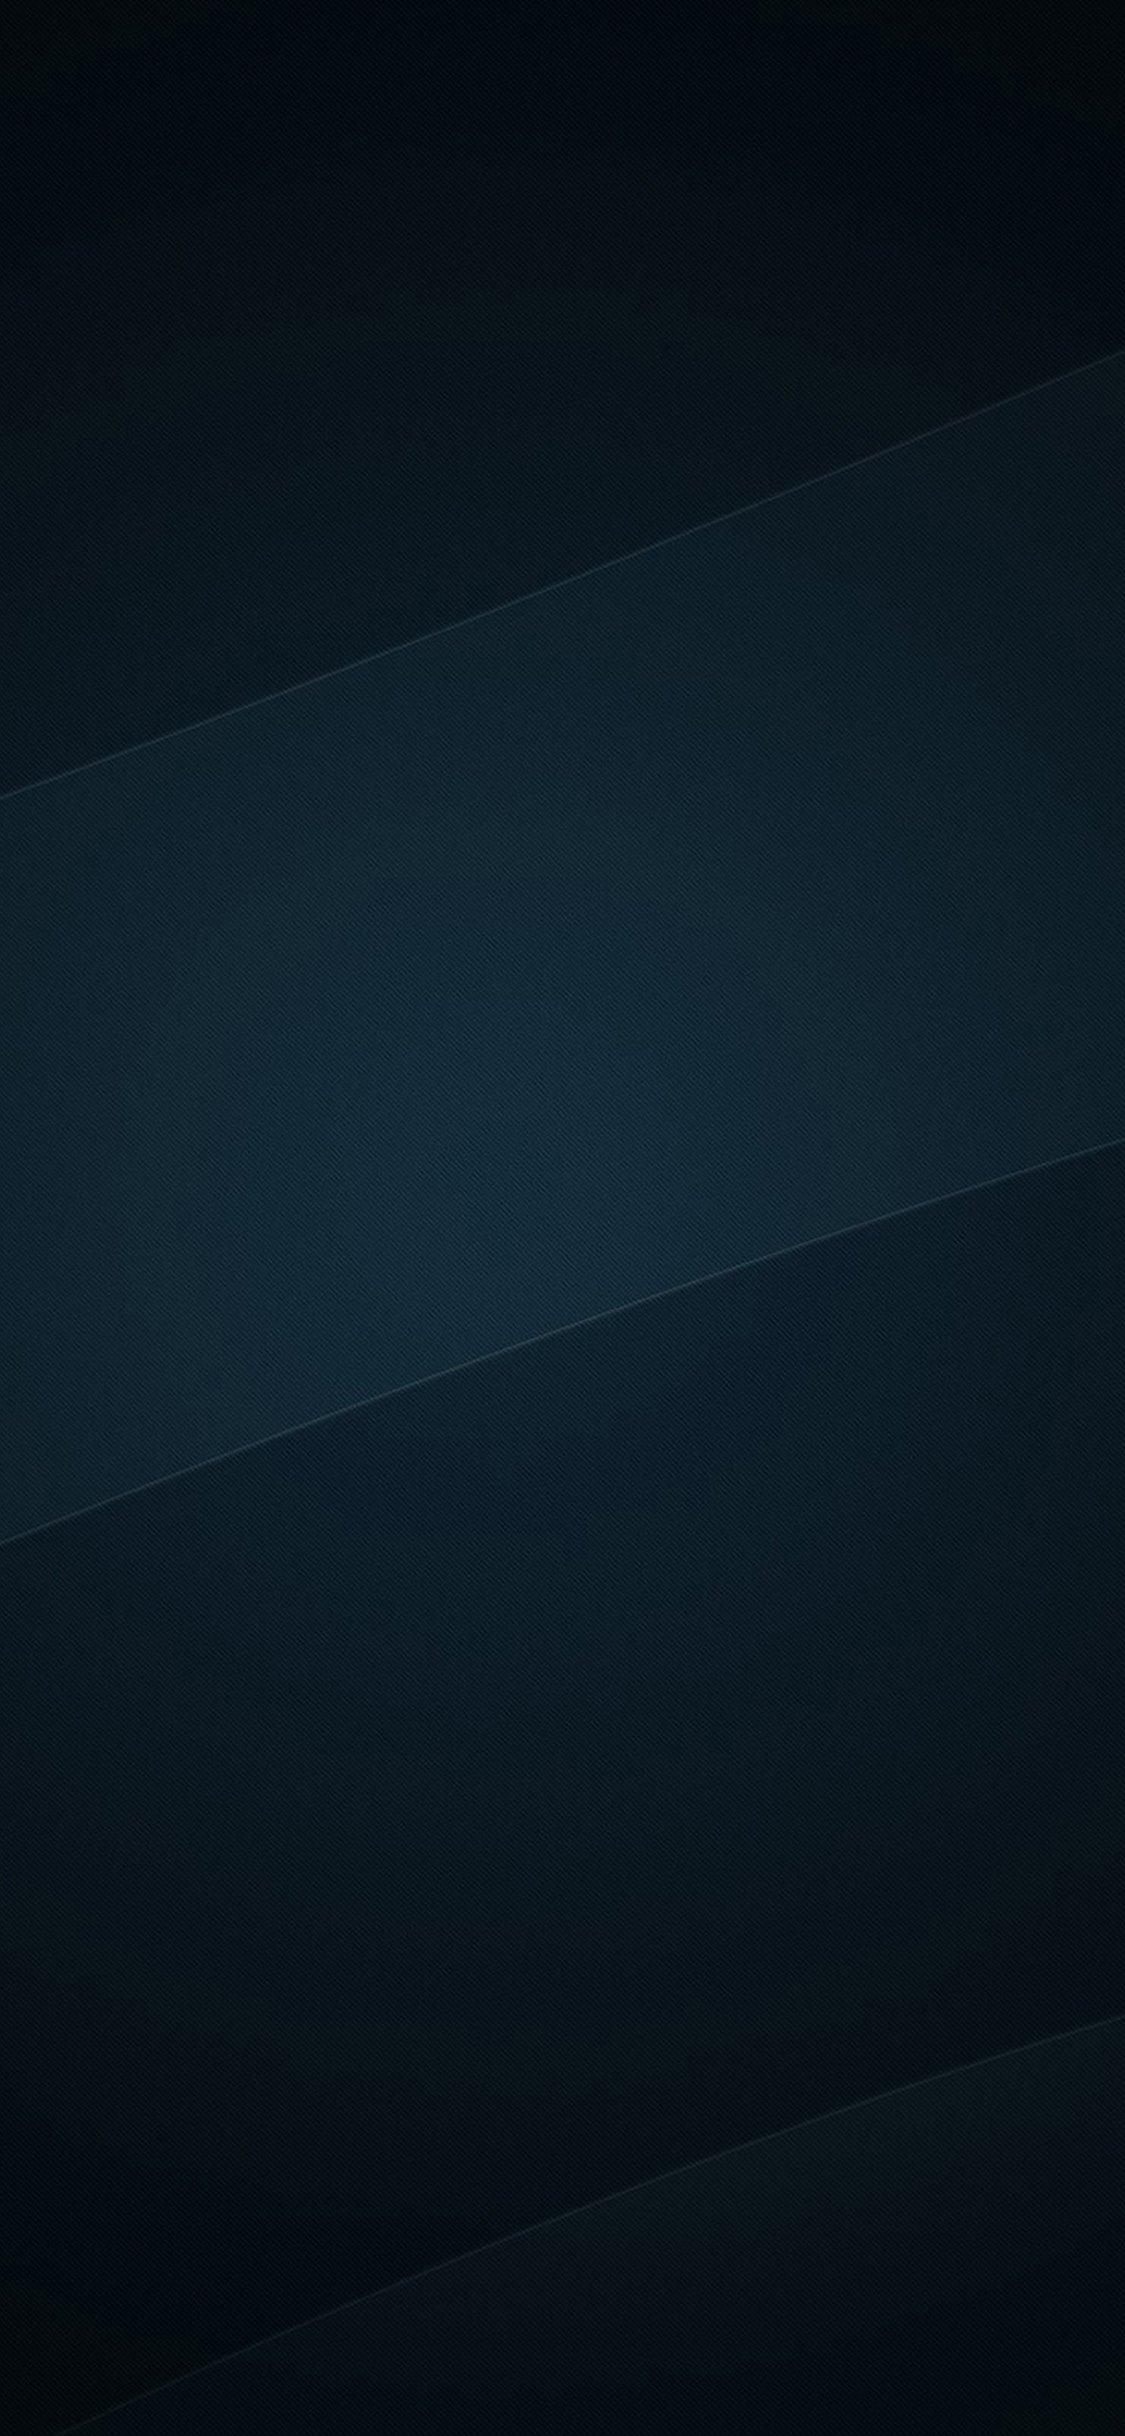 Best Aesthetic Iphone X Wallpapers Hd Ilikewallpaper